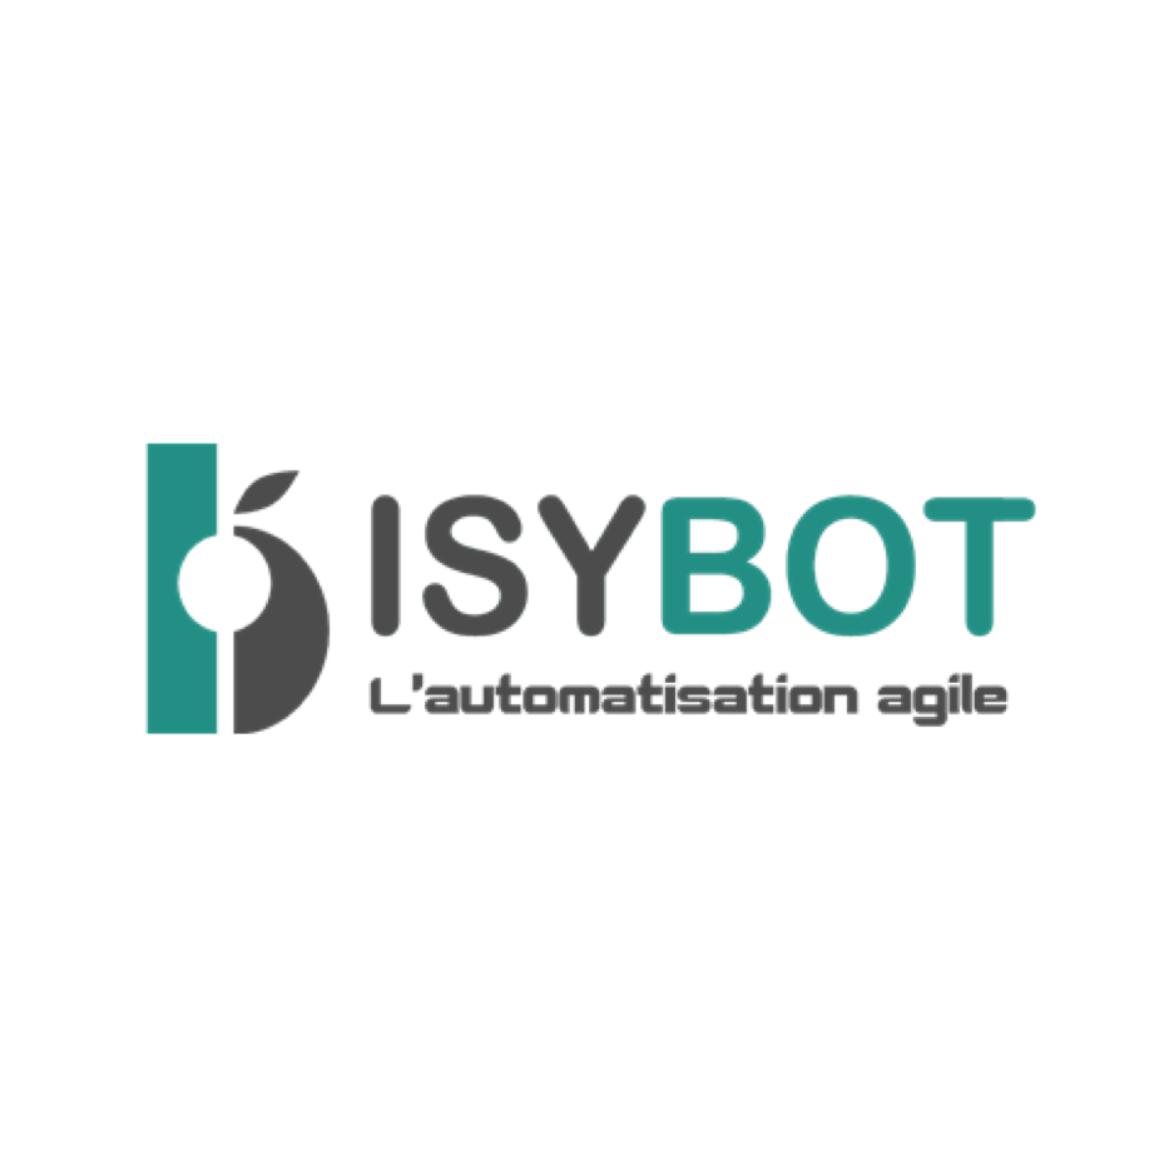 Isybot industrial collaborative robots aka cobots